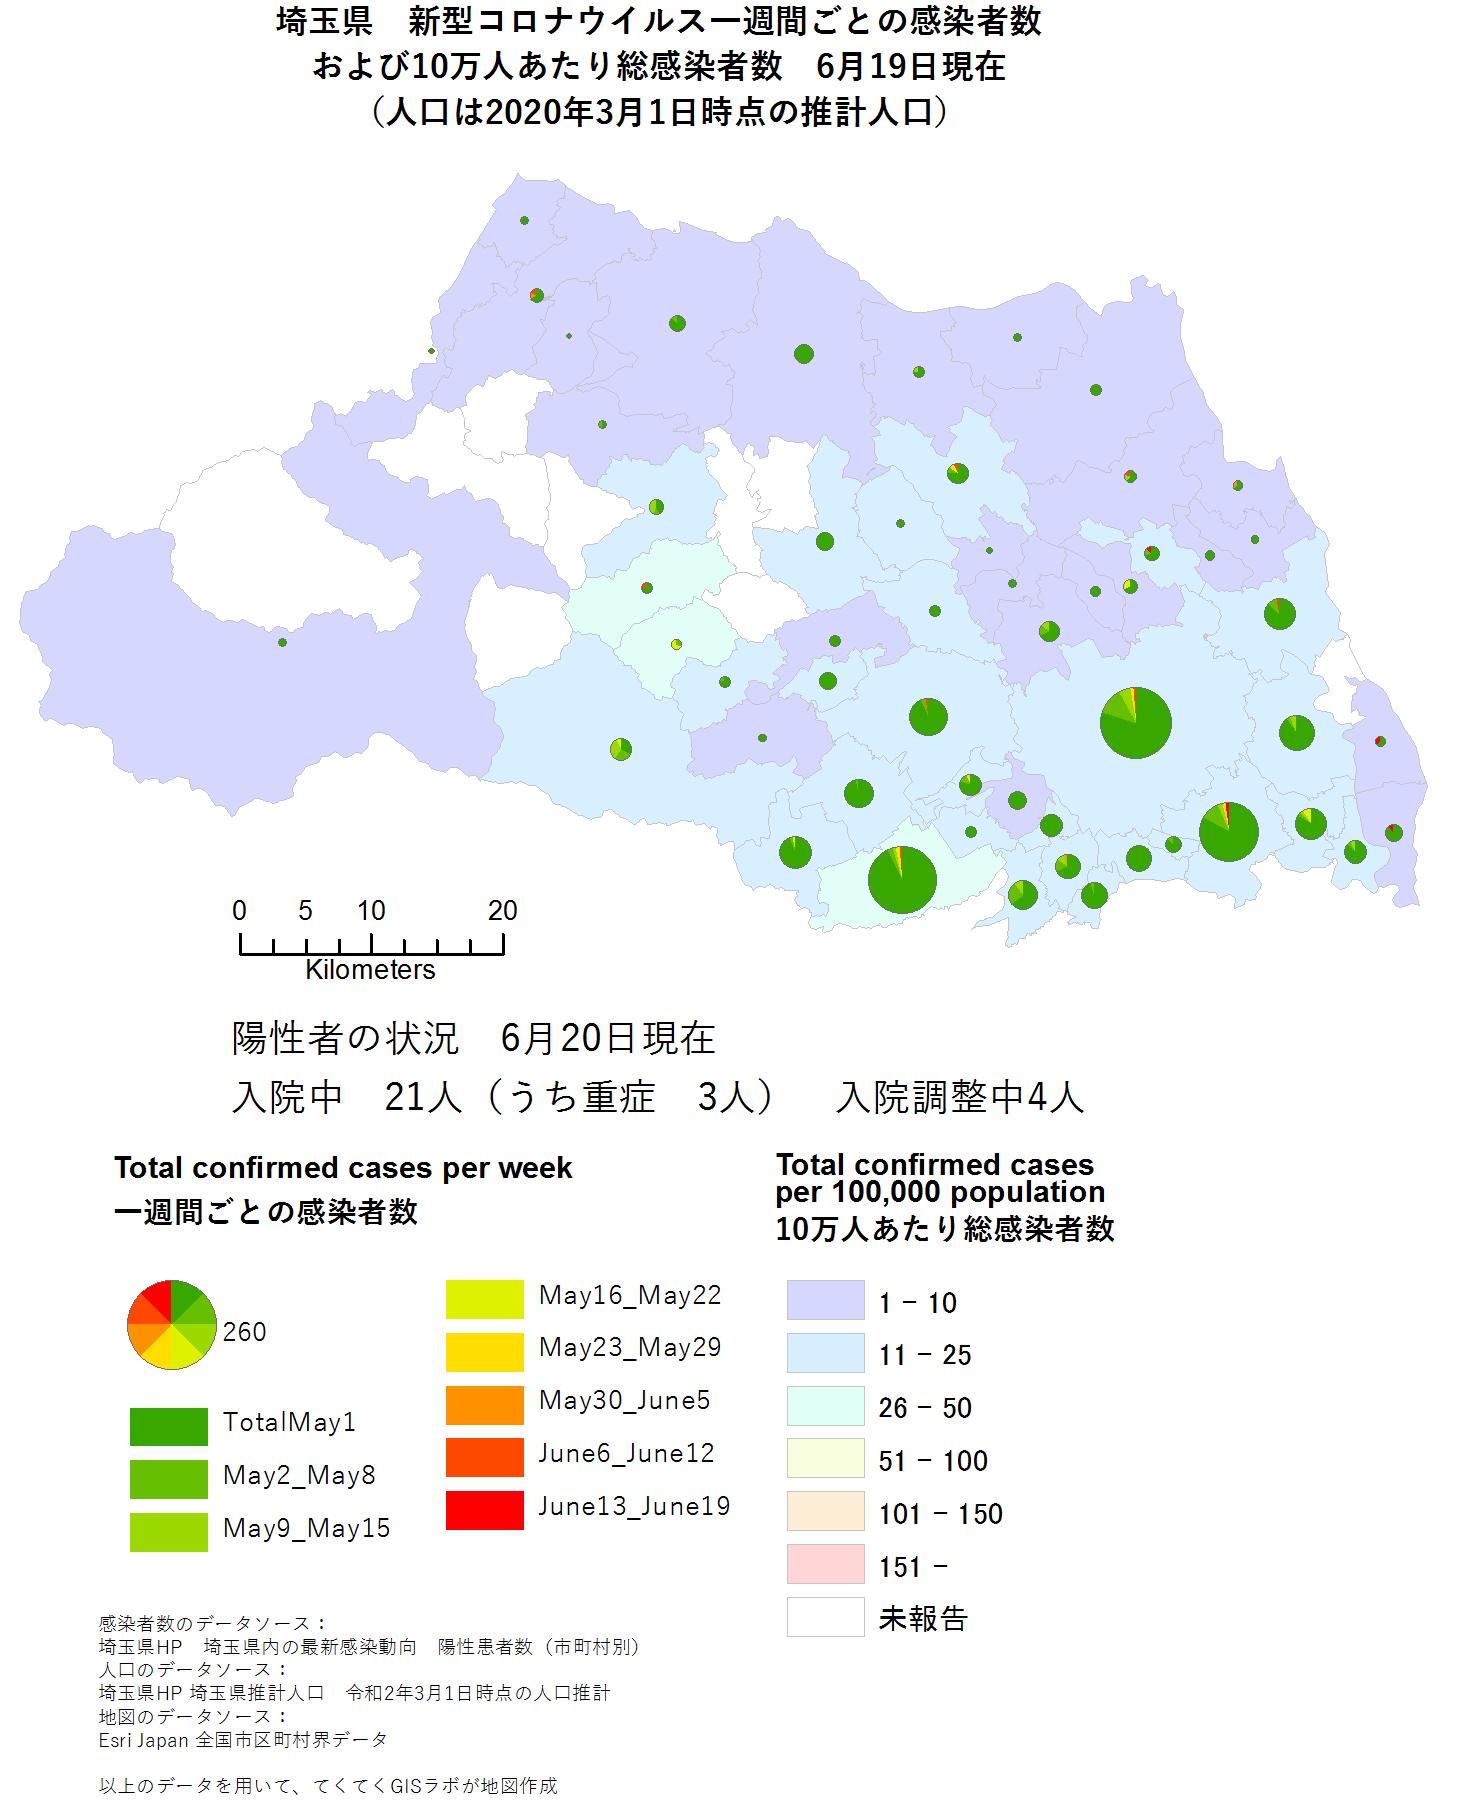 Total cases per week from May, Saitama